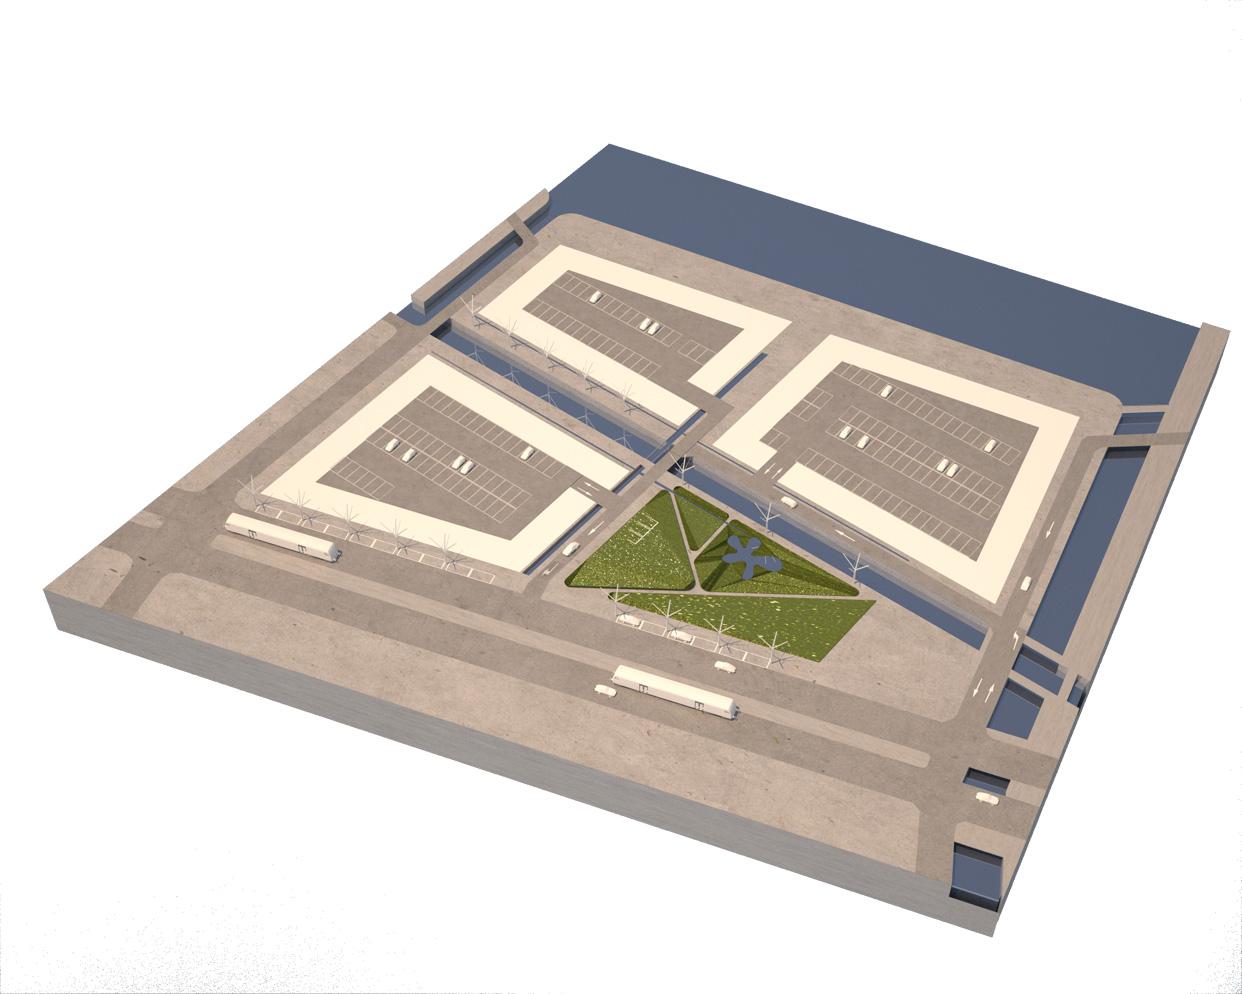 Jonkoping_Munksjon_Skeppsbrokajen_Bostader_Stadsbyggnad_Stadsplanering_Tavling_Typkvarter2_Varg_Arkitekter